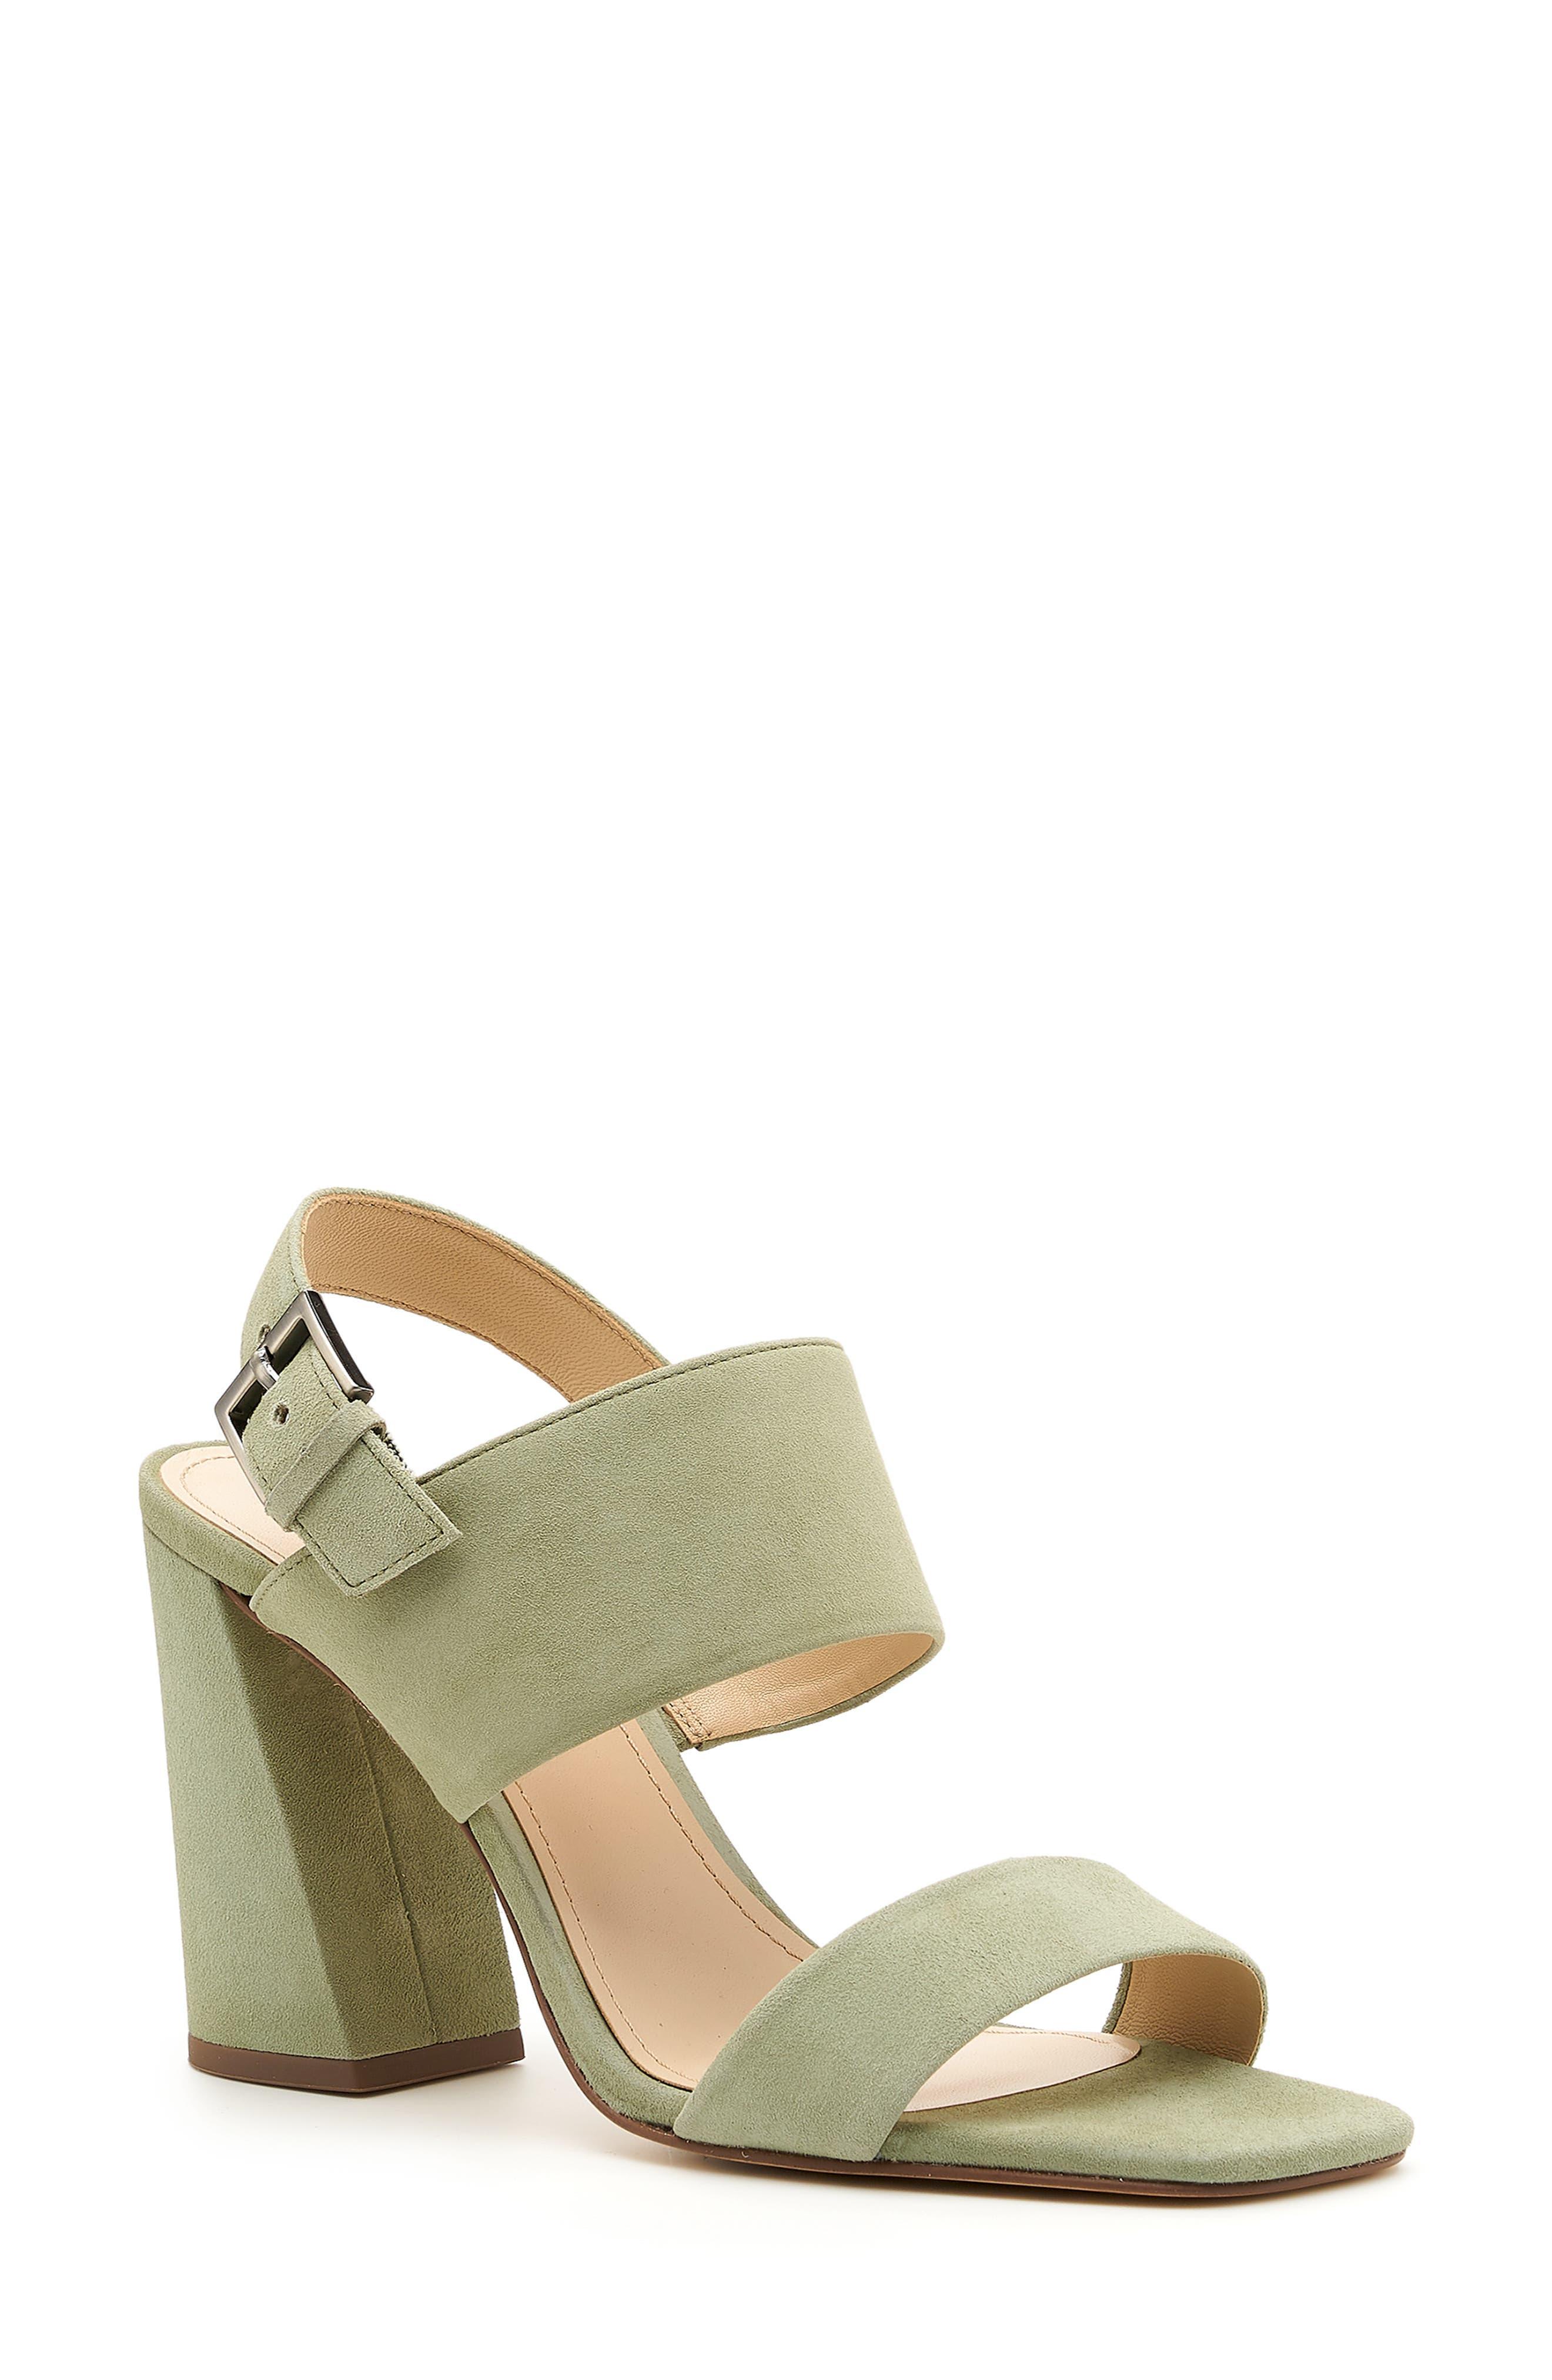 Women's Botkier Shoes | Nordstrom